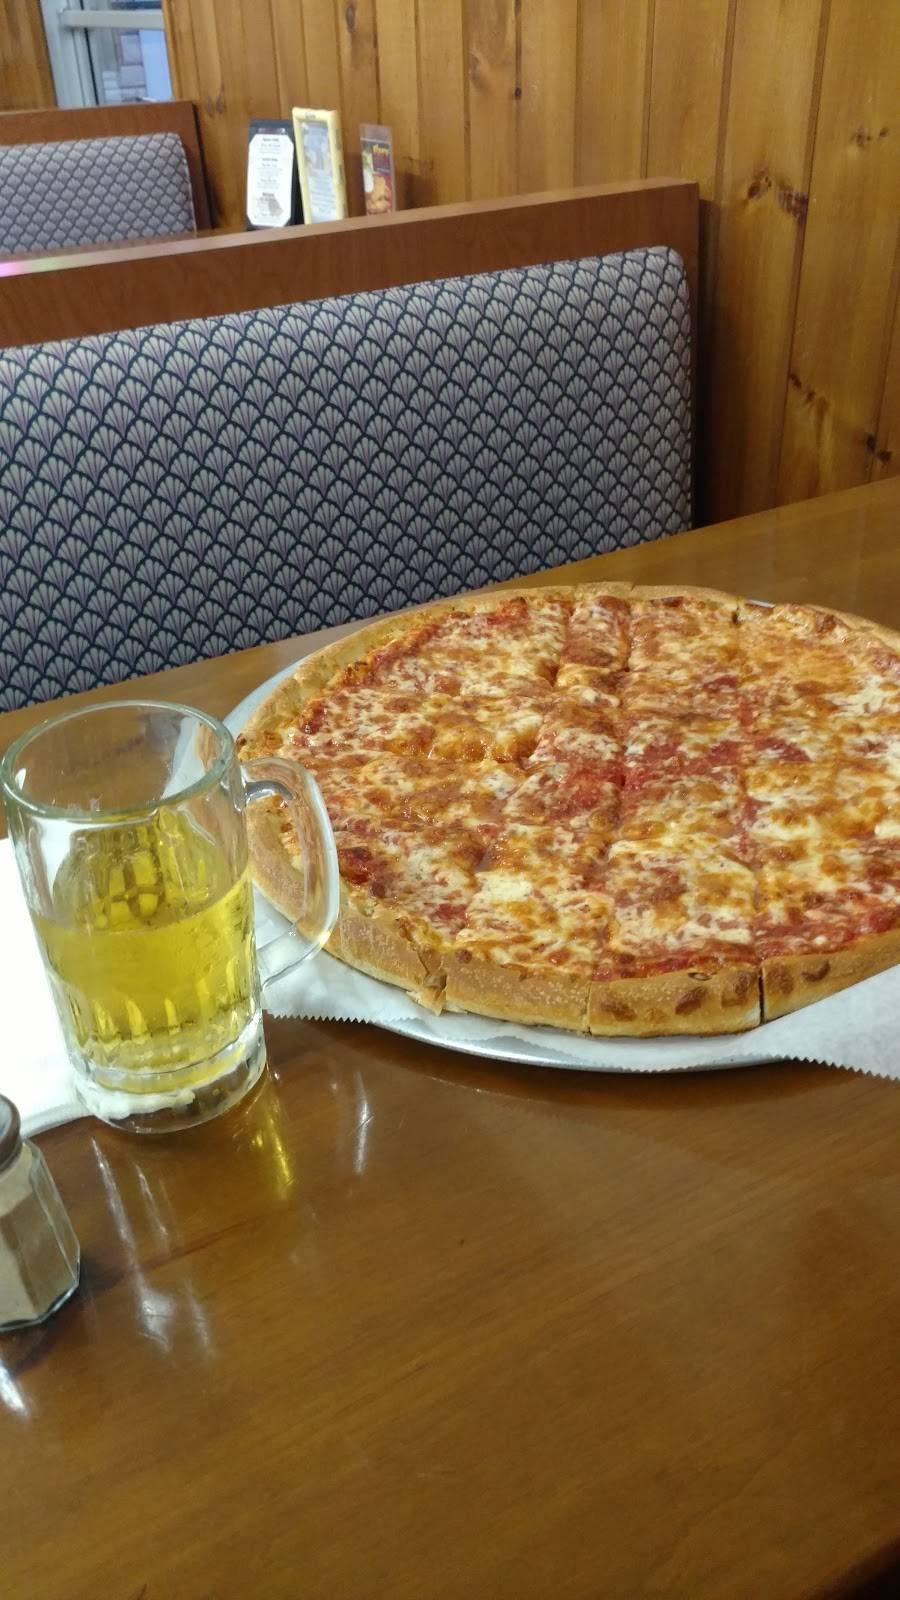 ABC | restaurant | 198 Quassaick Ave, New Windsor, NY 12553, USA | 8455622060 OR +1 845-562-2060